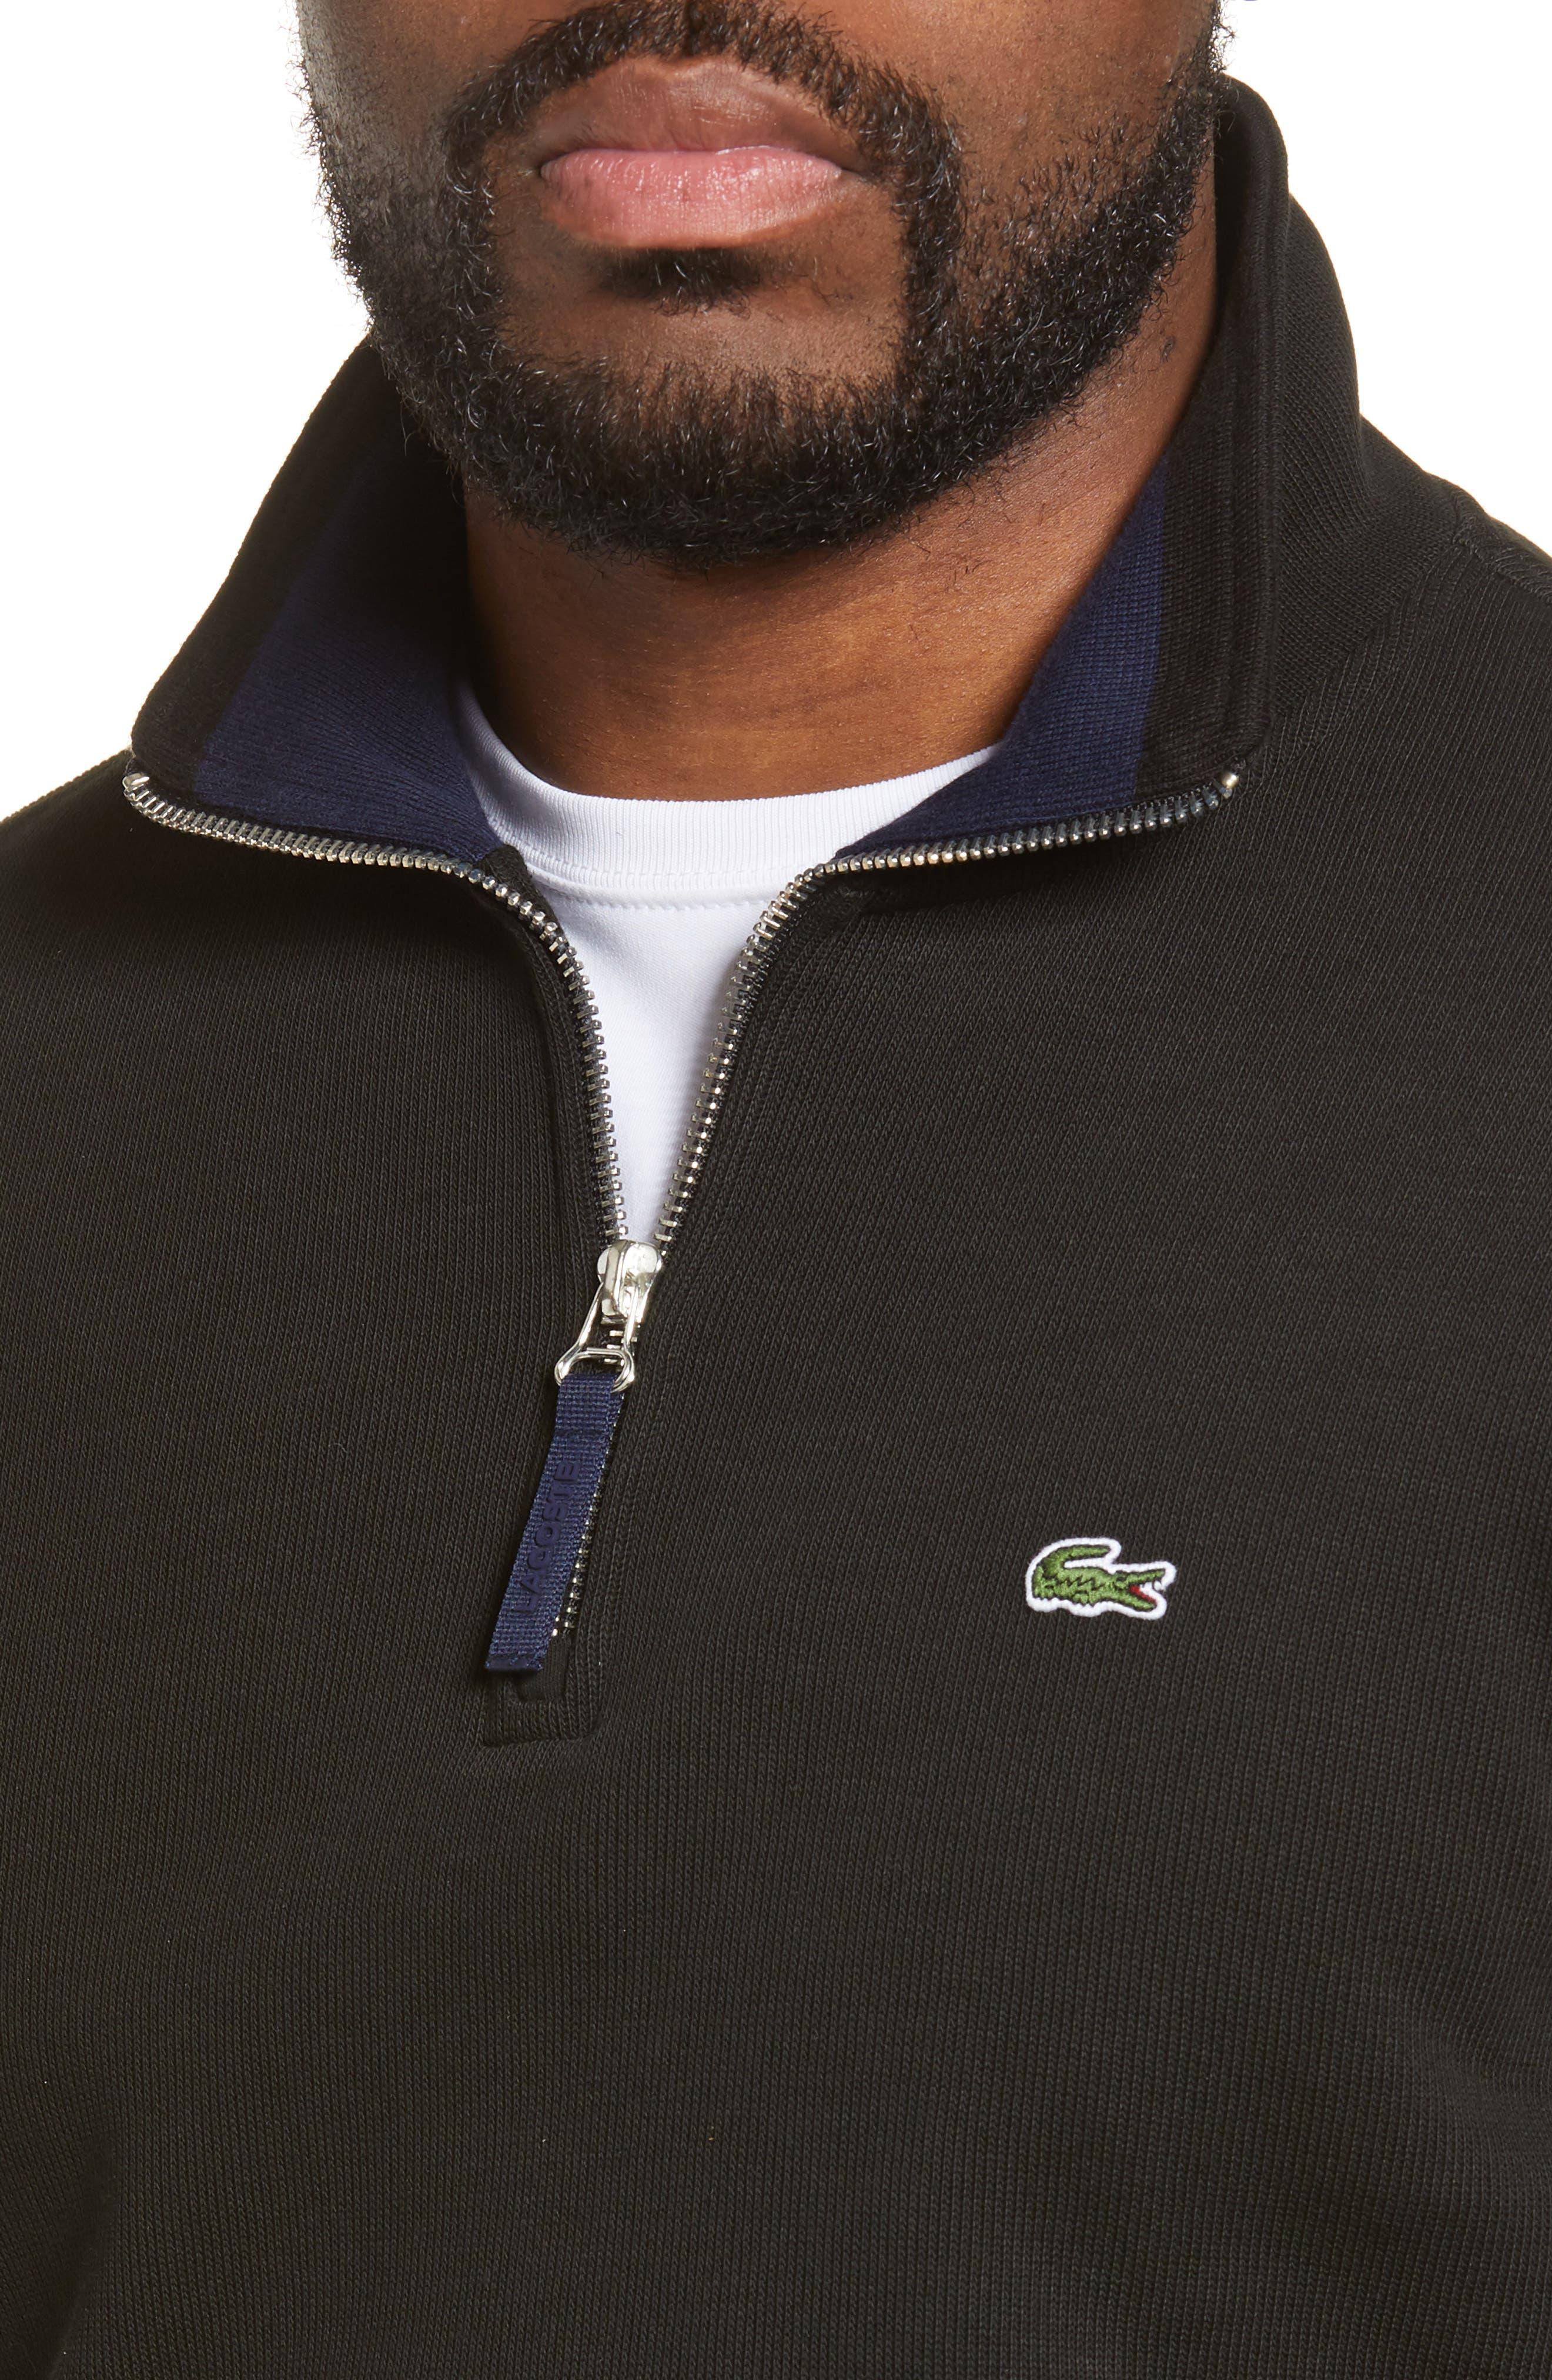 LACOSTE,                             Quarter Zip Pullover,                             Alternate thumbnail 4, color,                             BLACK/ NAVY BLUE